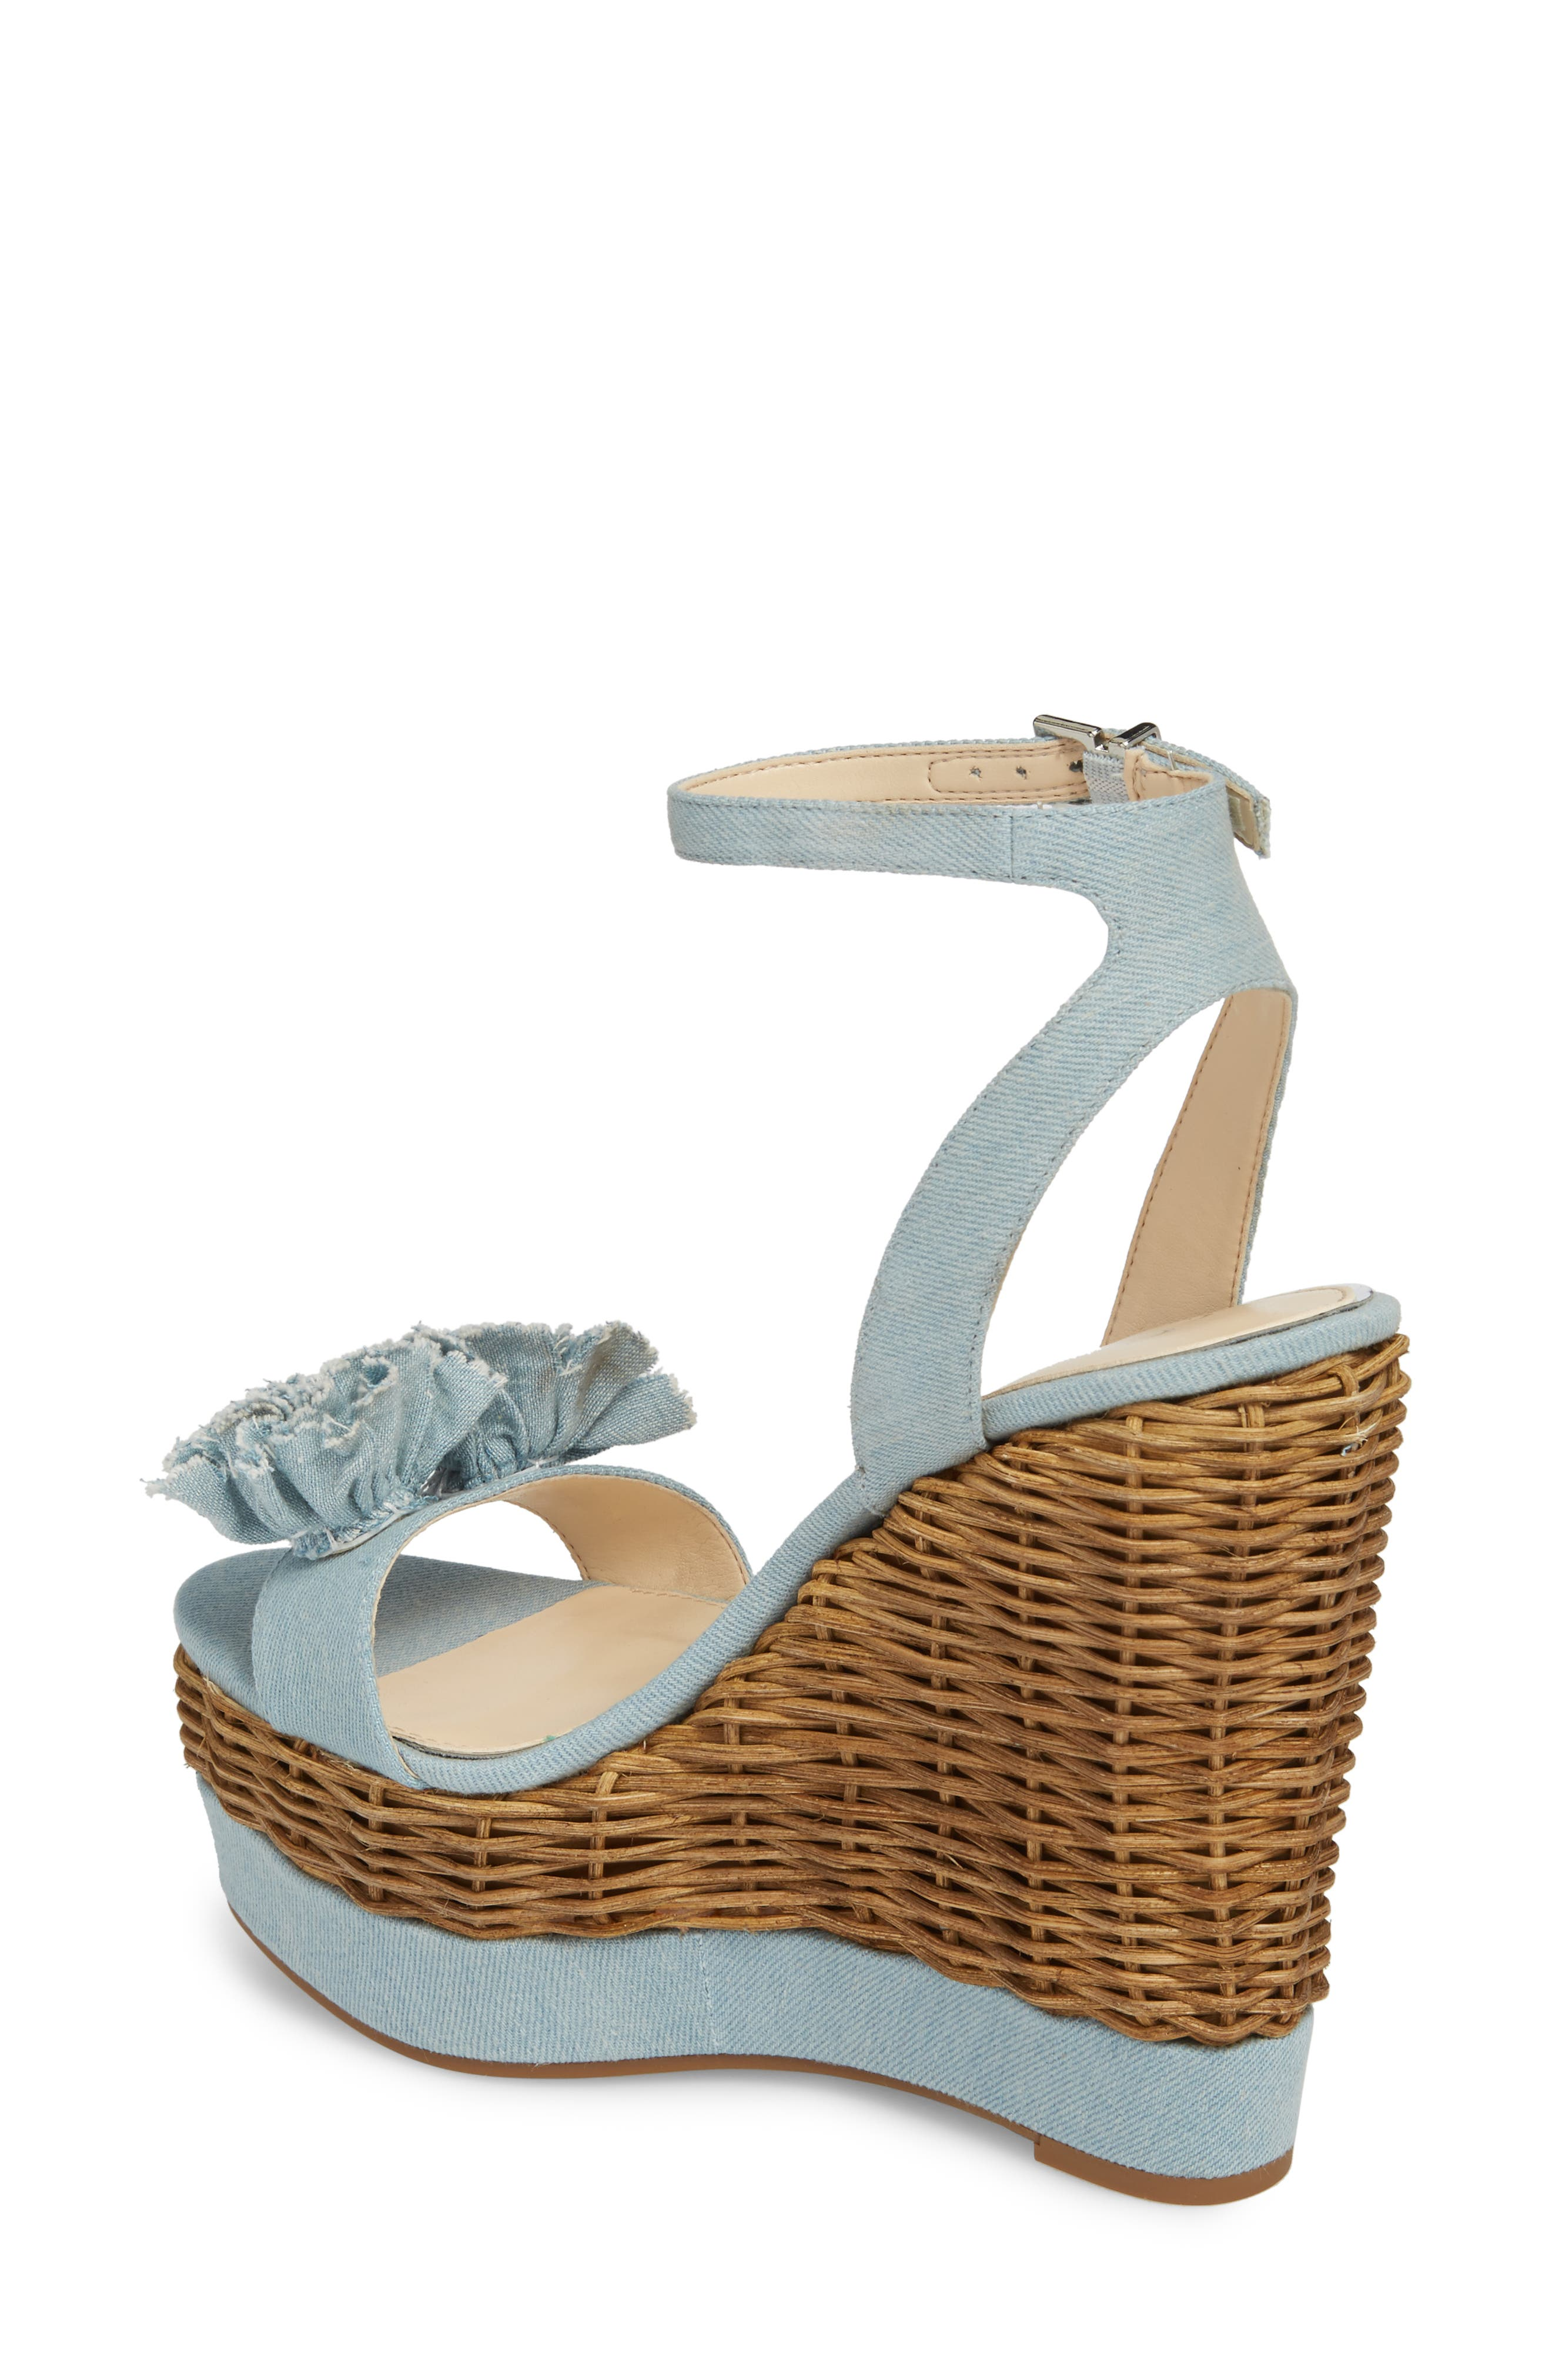 Pressa Platform Wedge Sandal,                             Alternate thumbnail 2, color,                             VINTAGE BLUE